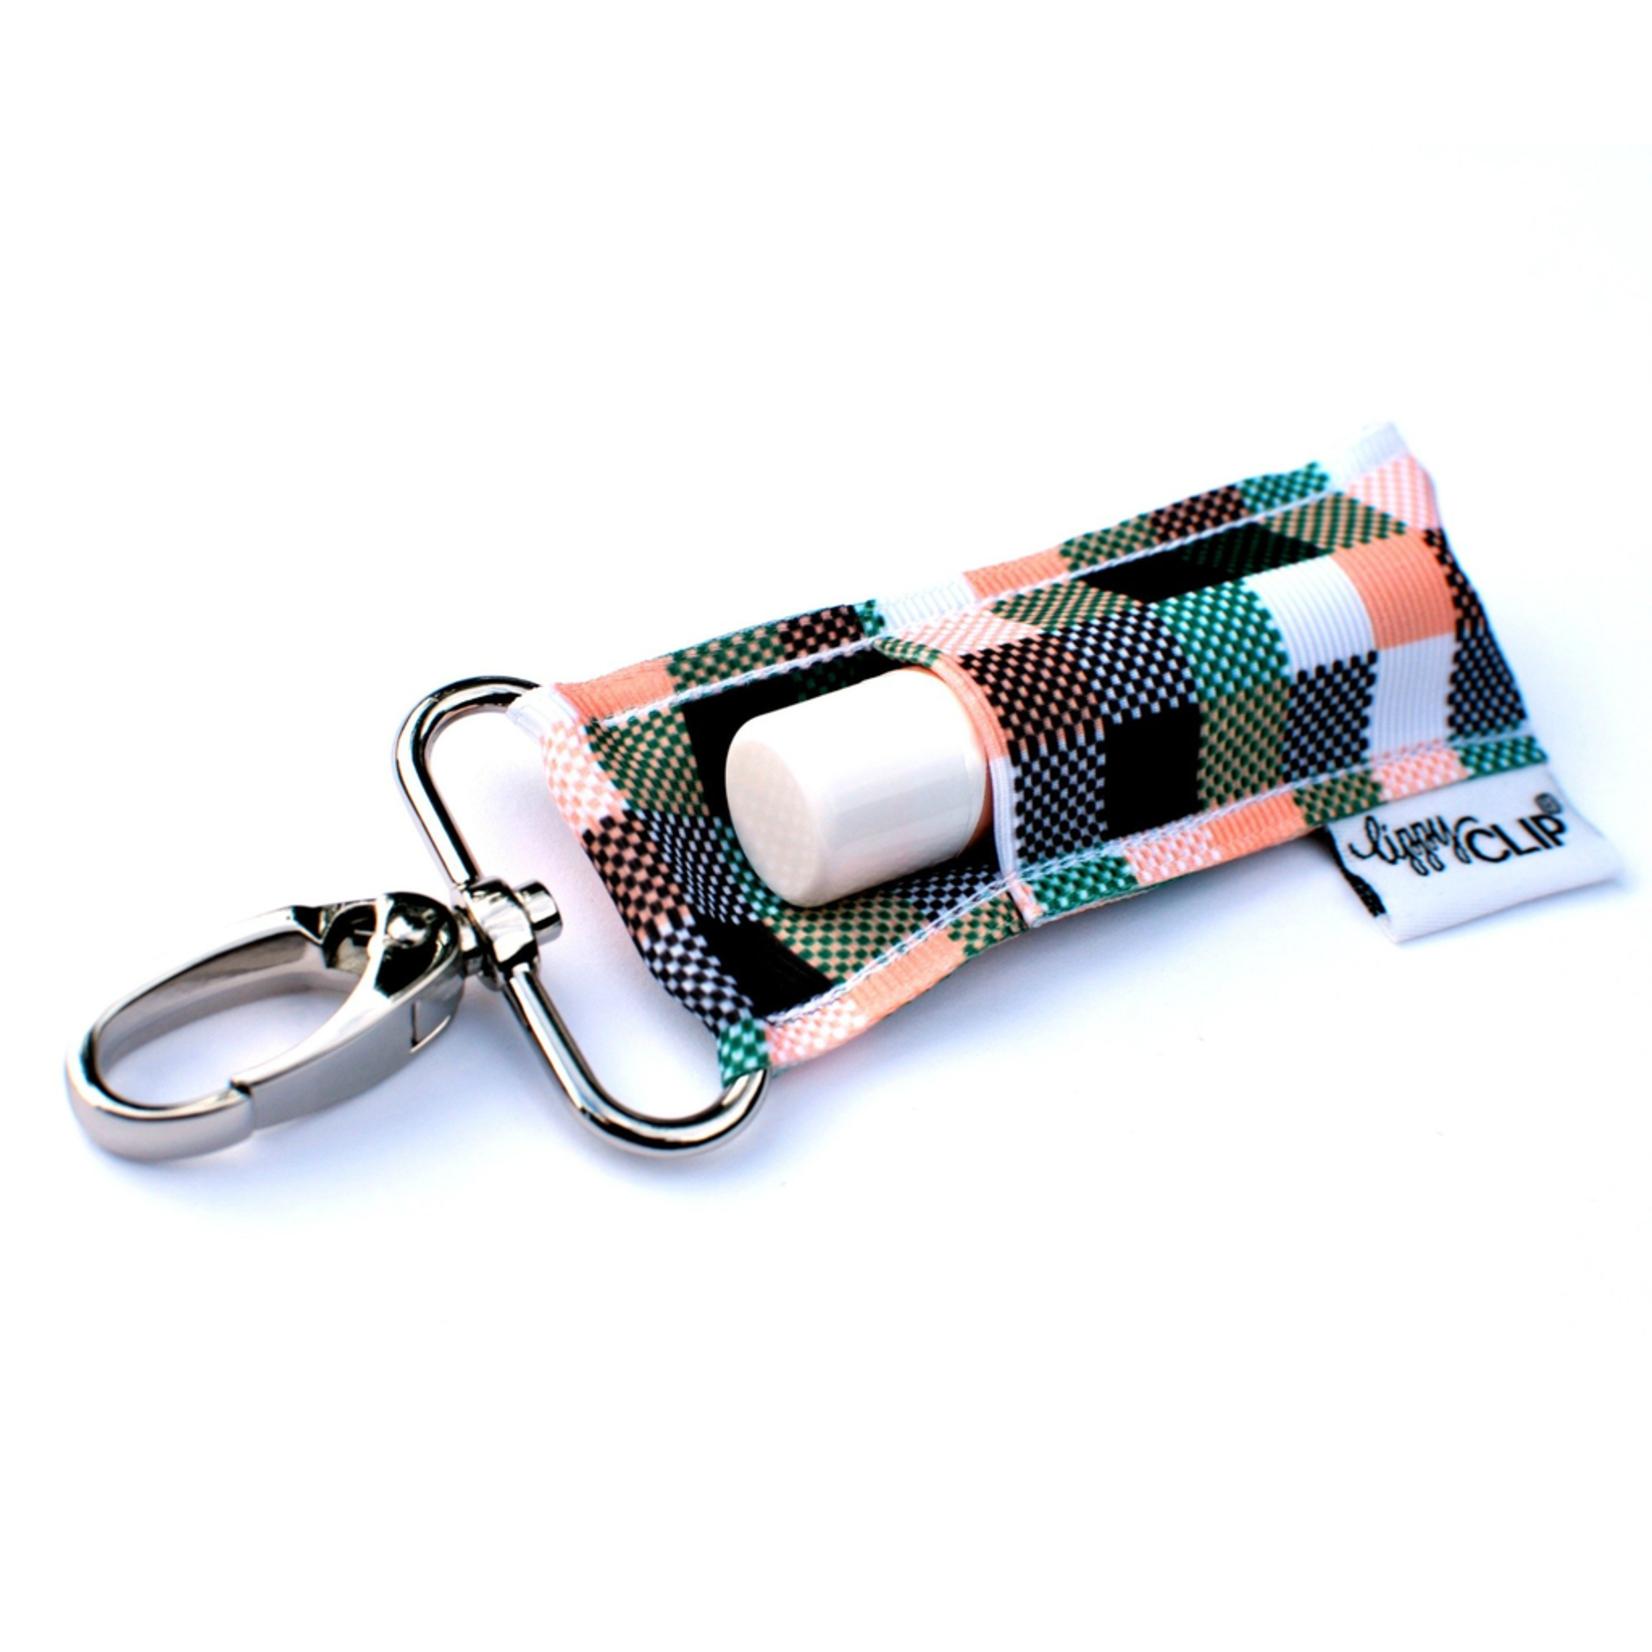 LippyClip Geometric lip balm holder